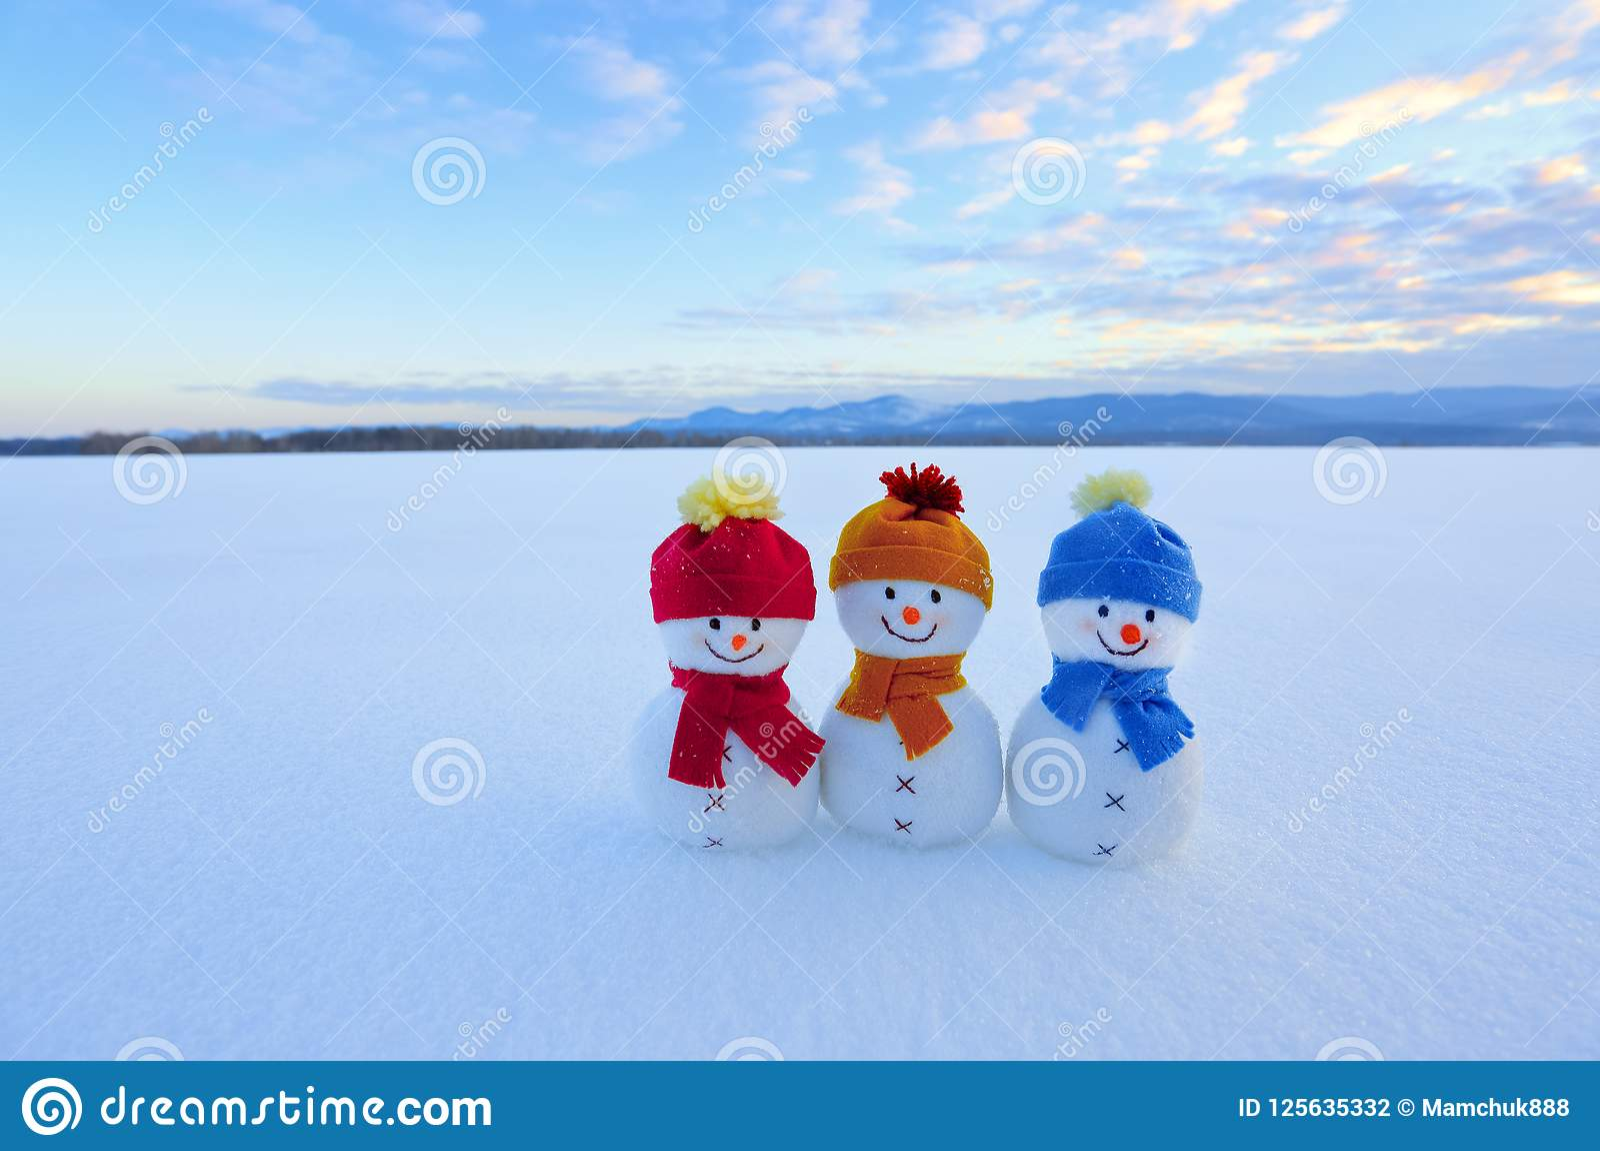 140d69fdfb18b Friends Snowman In Red